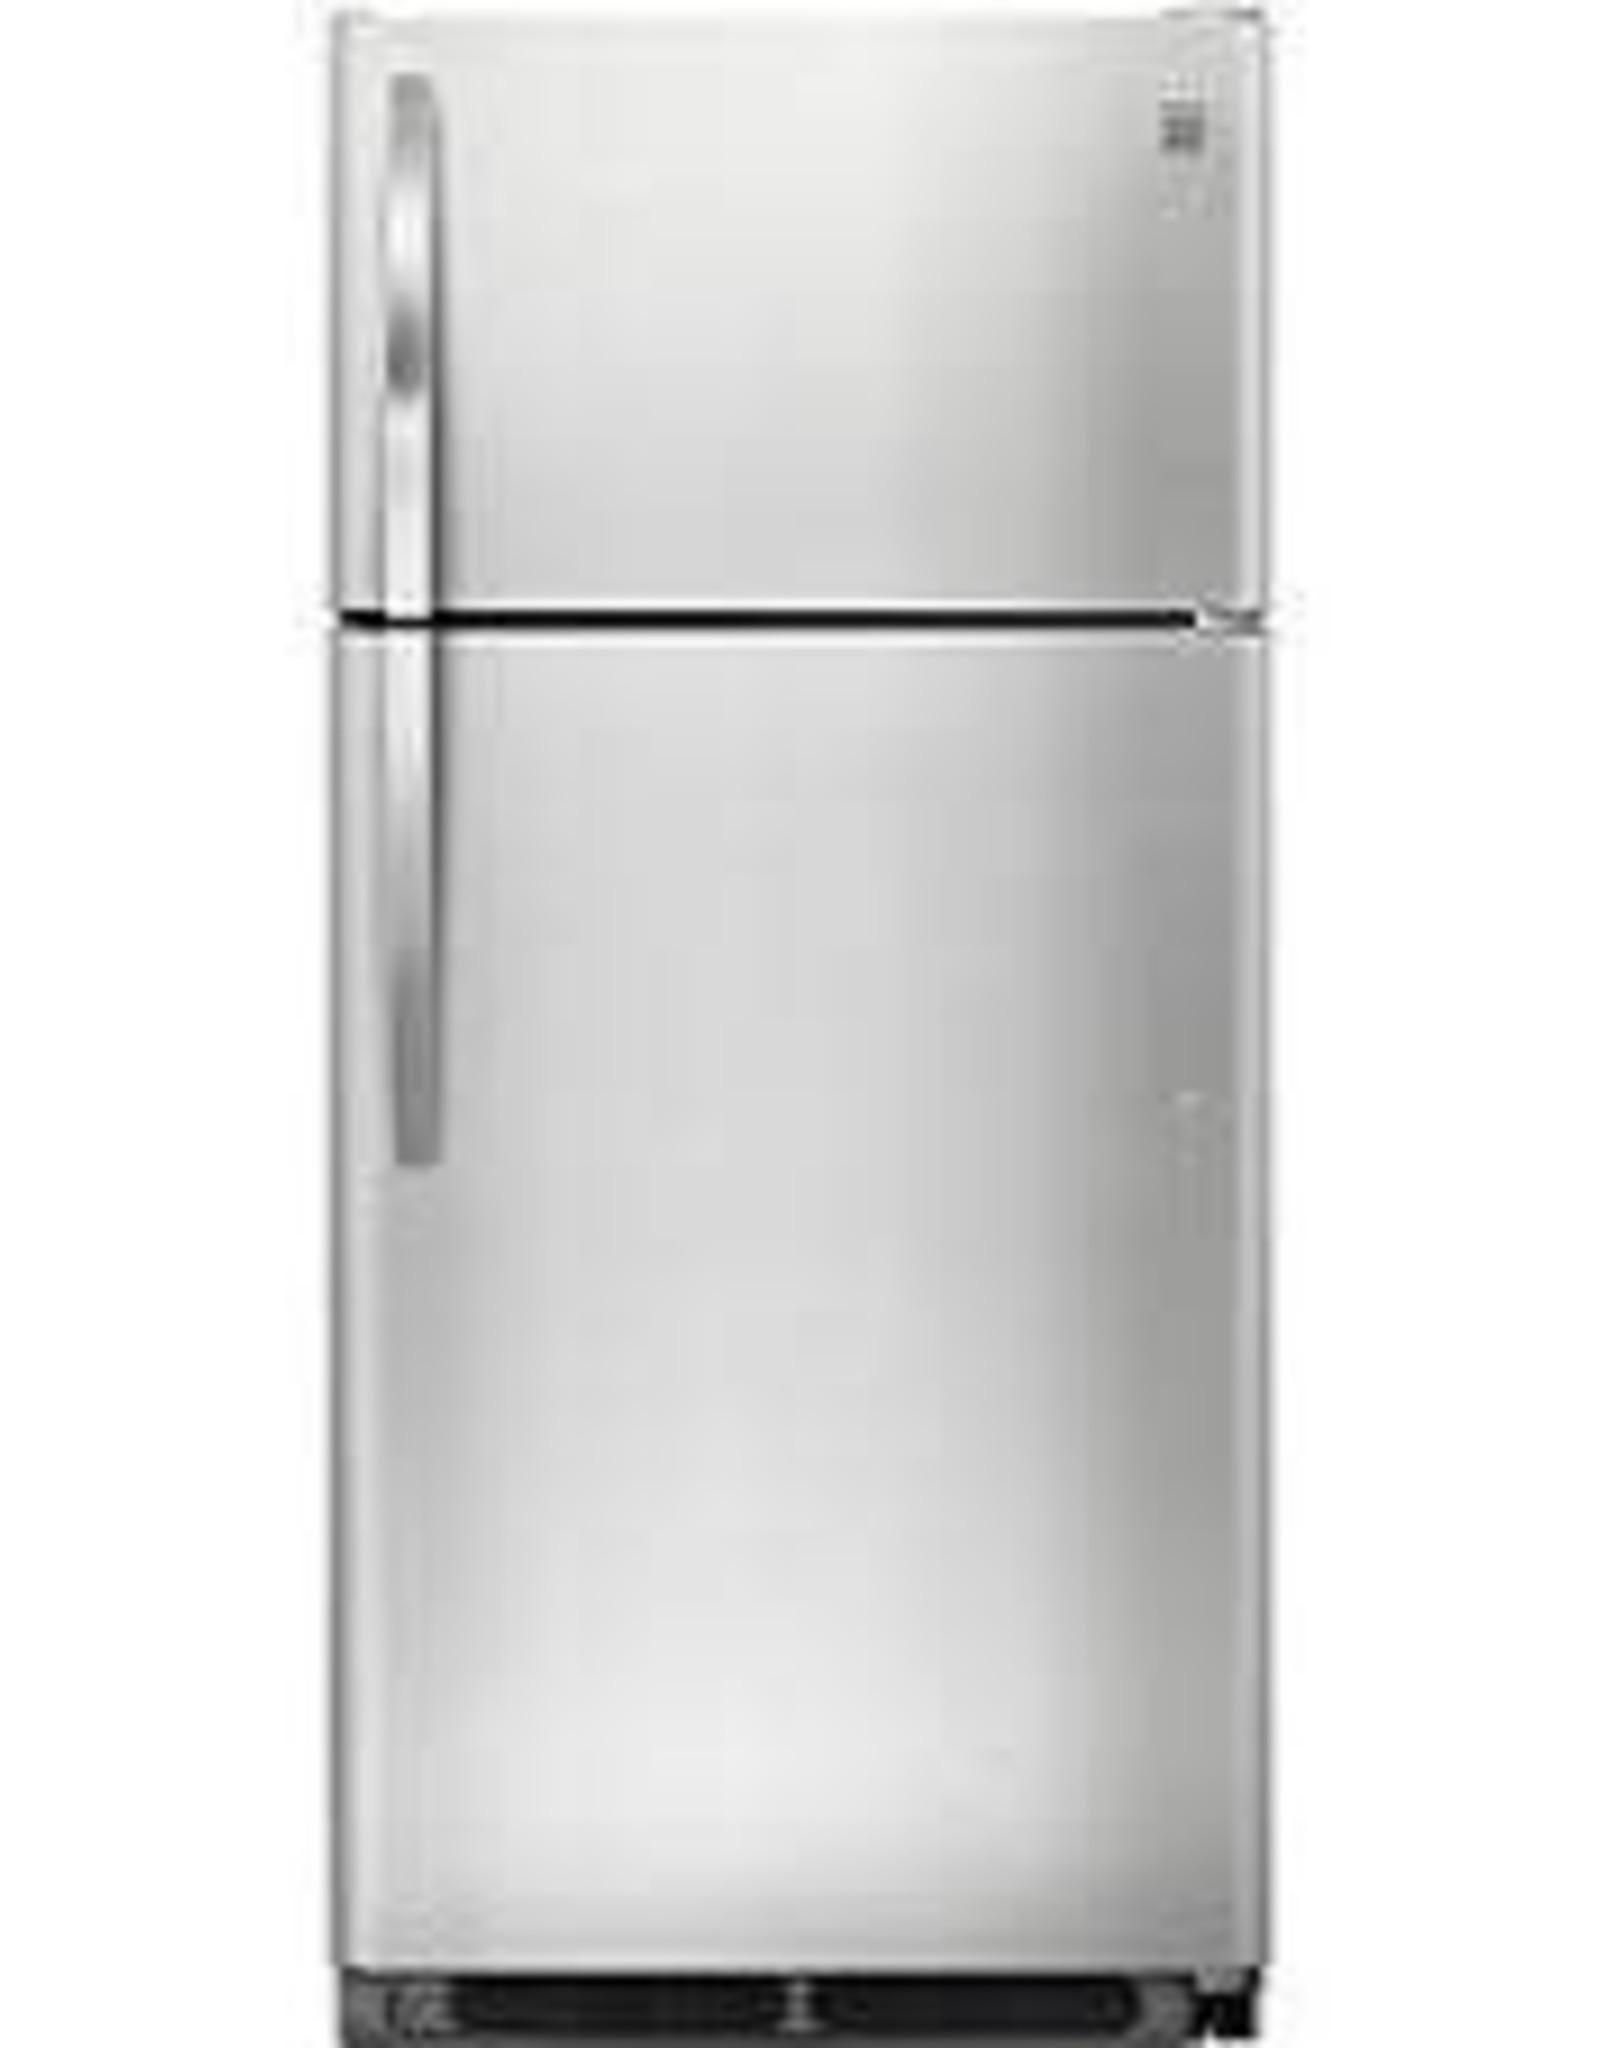 CLS Consevator 18 cft Refrigerator